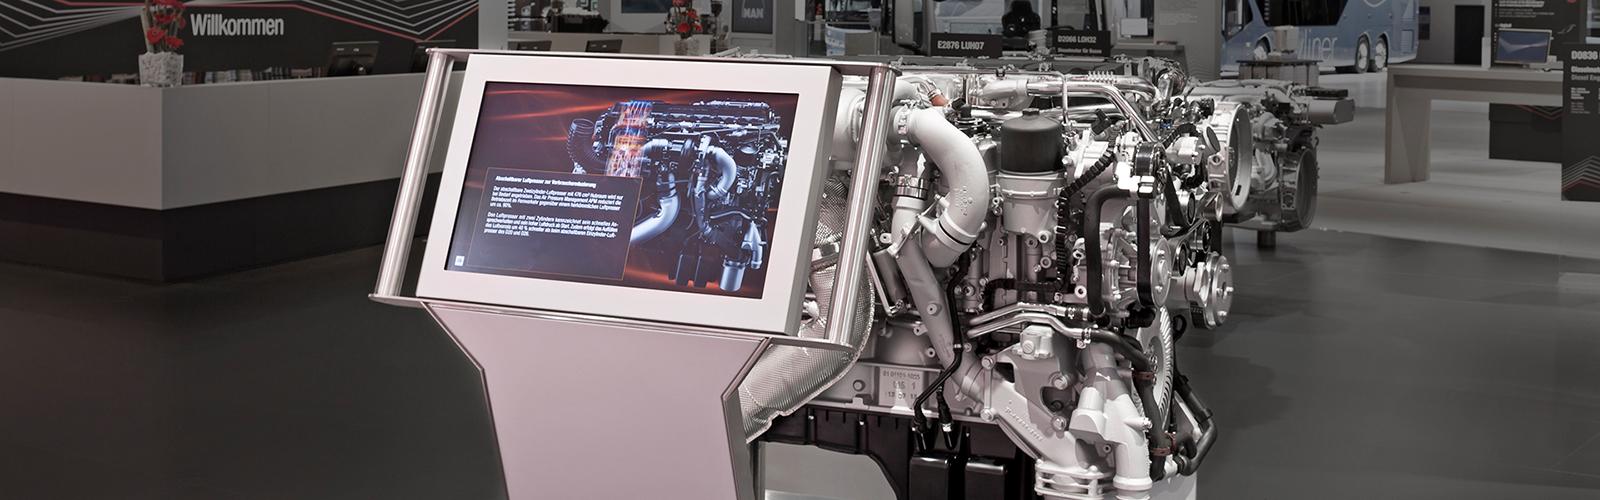 Braunwagner Digital und Media Design shift screen scanner MAN IAA 2014